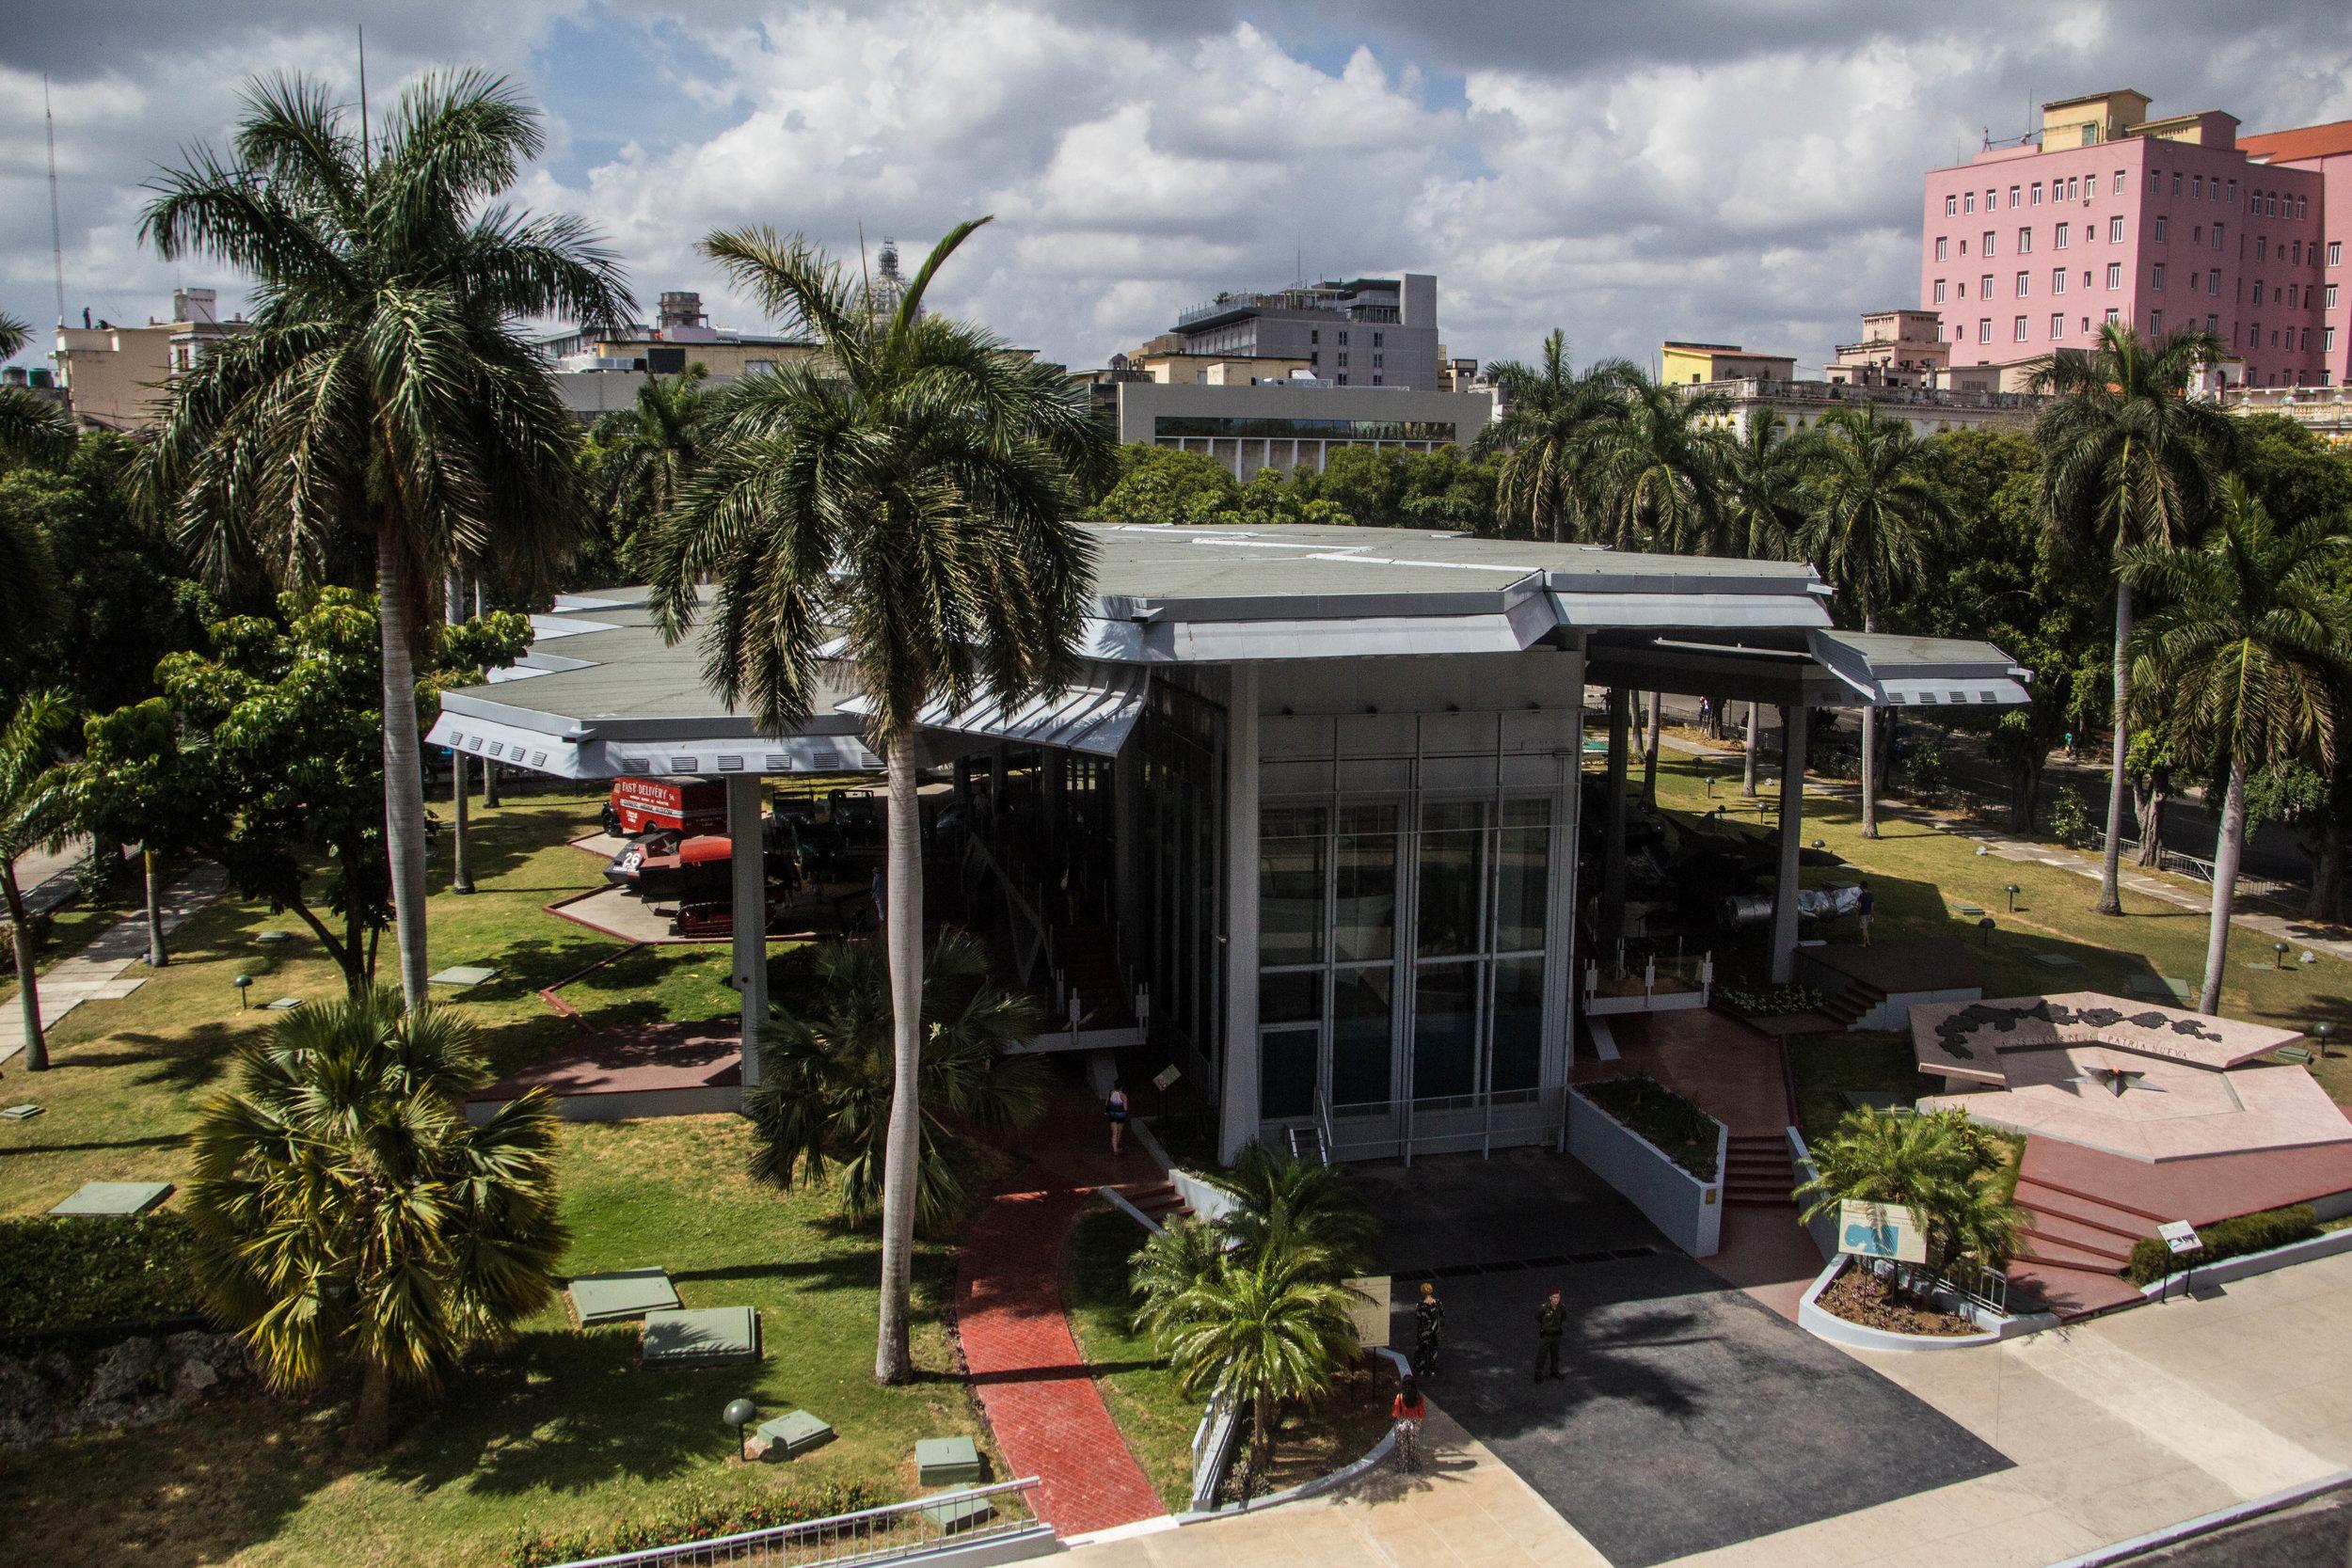 museum of the revolution havana cuba-1-3.jpg